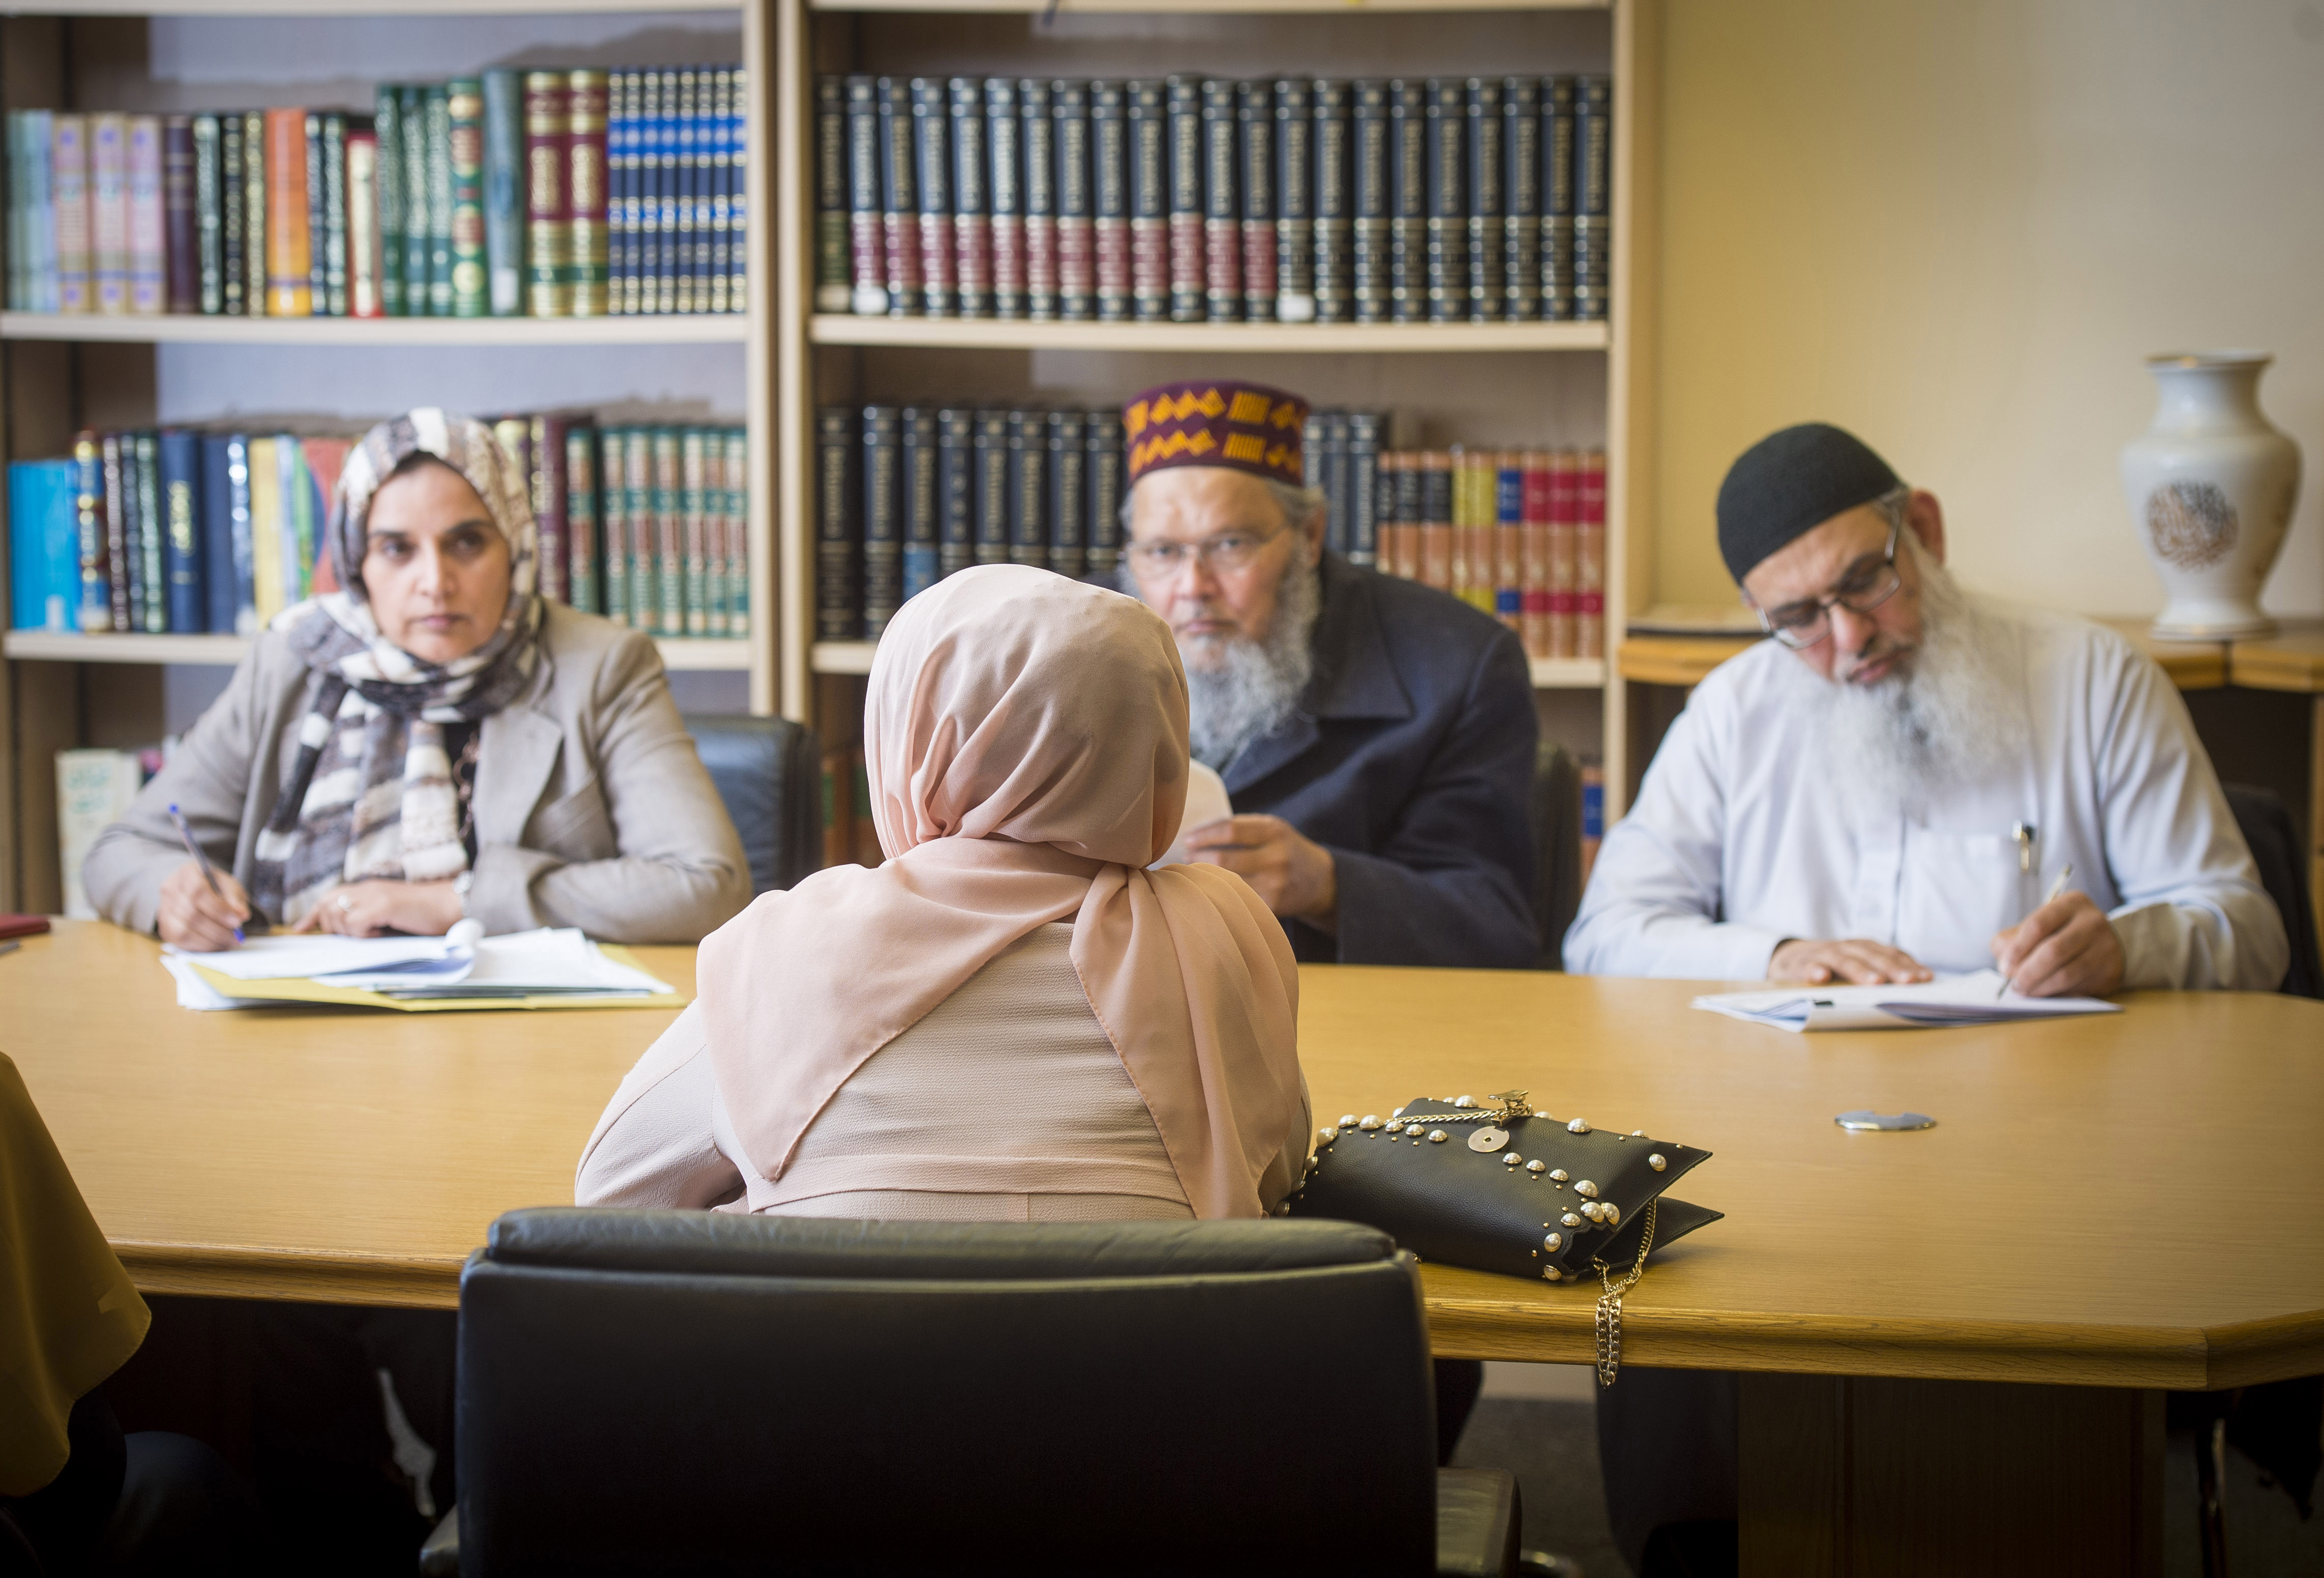 Sharia law council